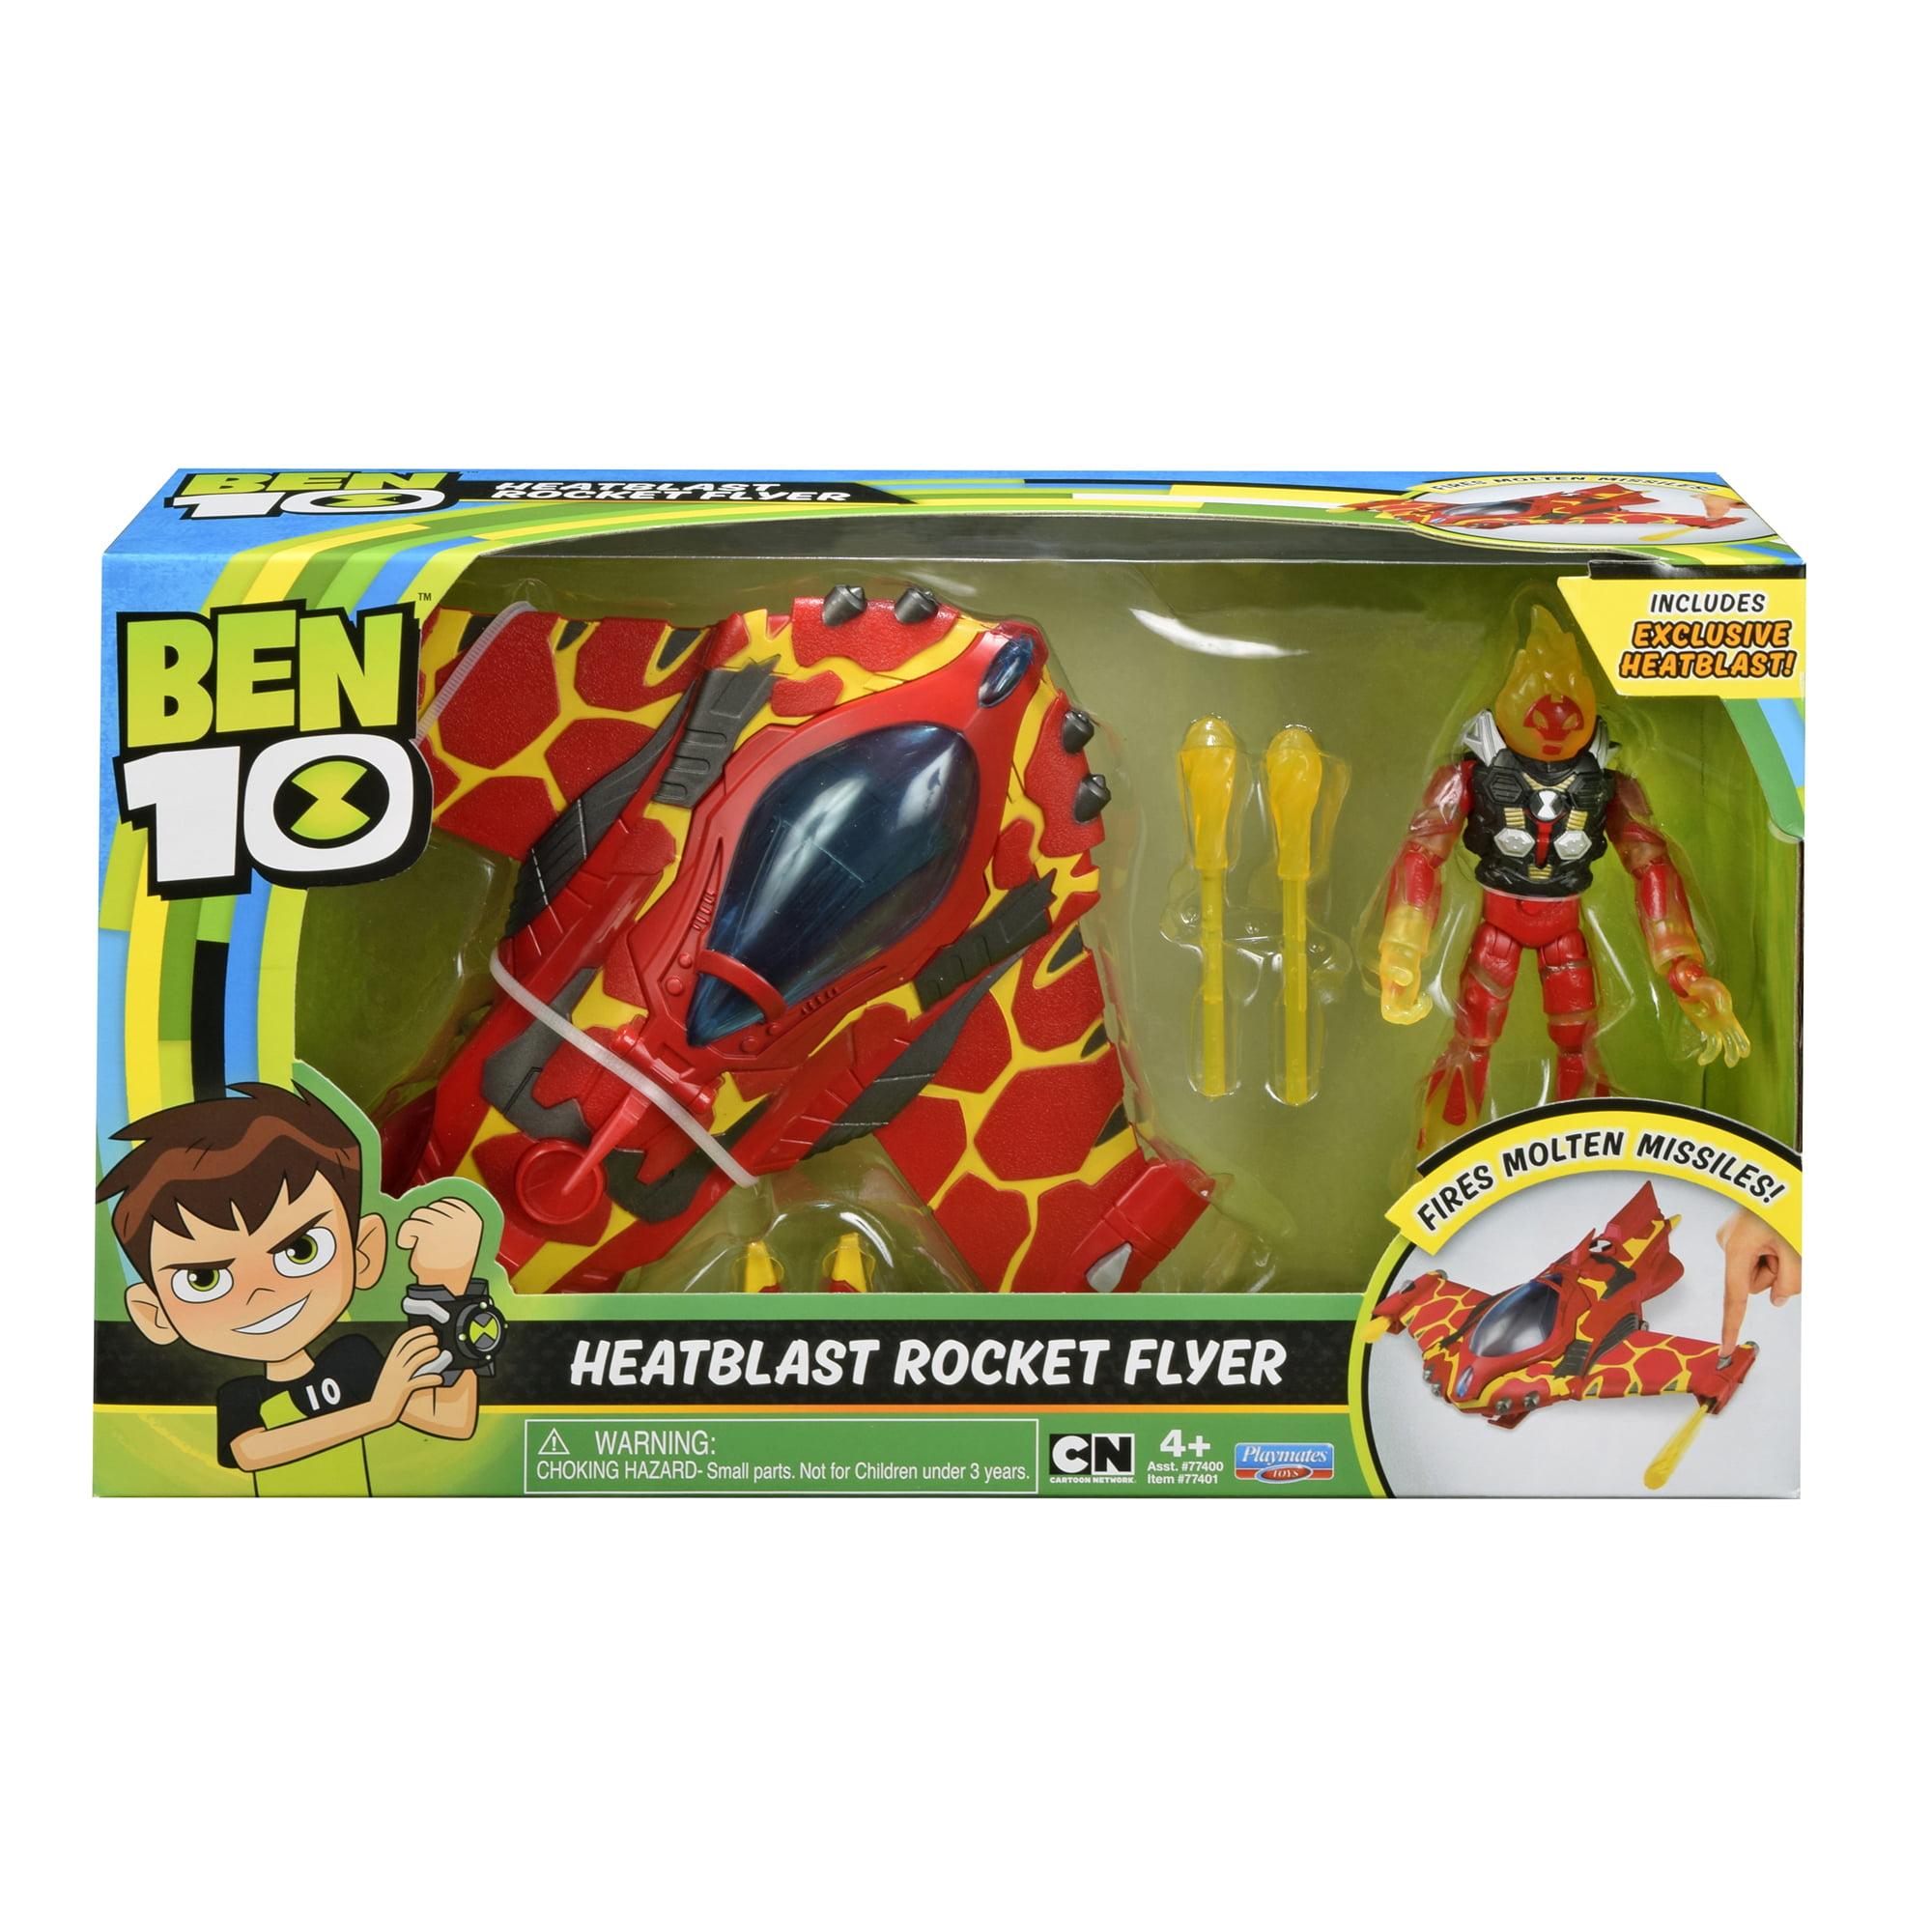 Ben10 Heatblast Rocket Flyer with Figure by Playmates Toys Inc